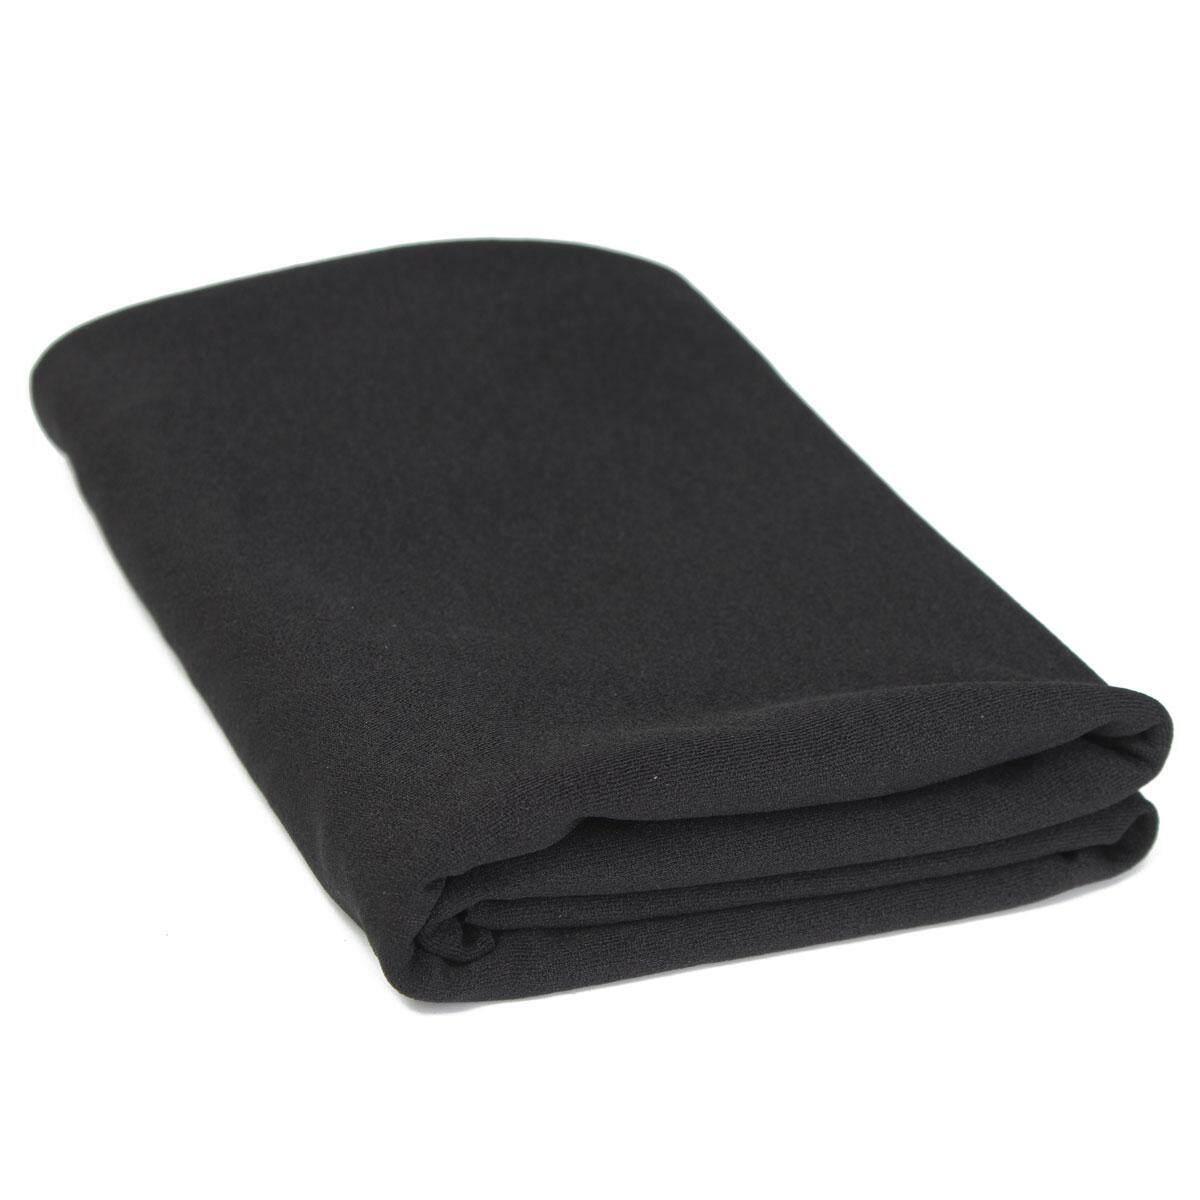 Black Audio Speaker Grill Cloth Stereo Fabric Speaker Mesh Cloth Thick 1.6x0.5m